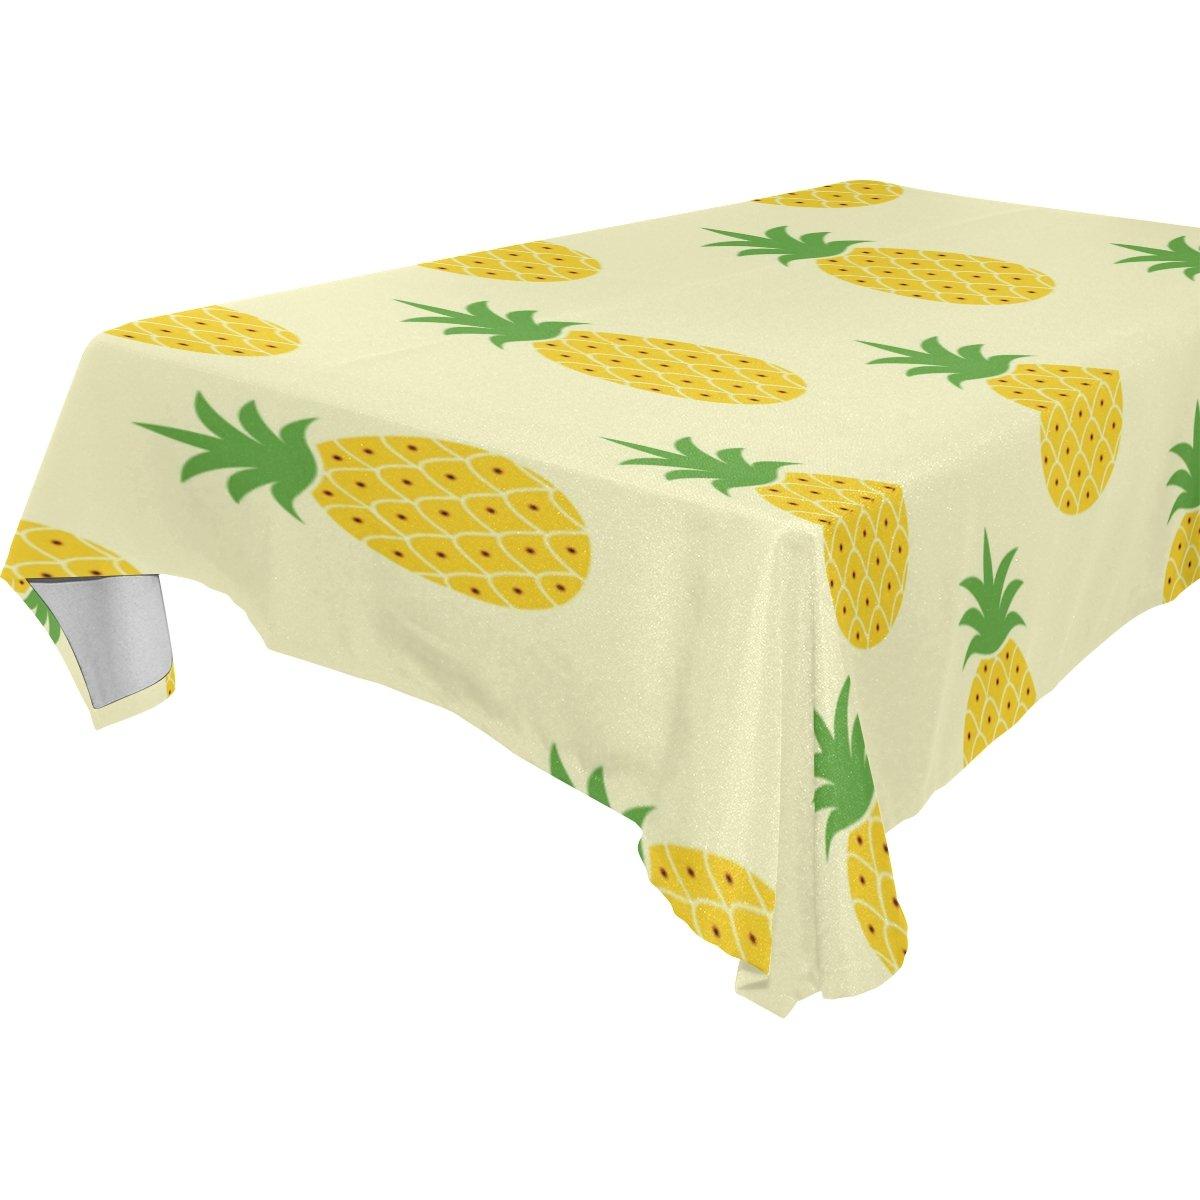 Laランダムキュート夏パイナップルテーブルクロスダイニングルームピクニックテーブル布洗濯可能テーブルカバーポリエステルAssortedサイズ1 60x90 inch LRZB00495 B079PVRKJX   60x90 inch